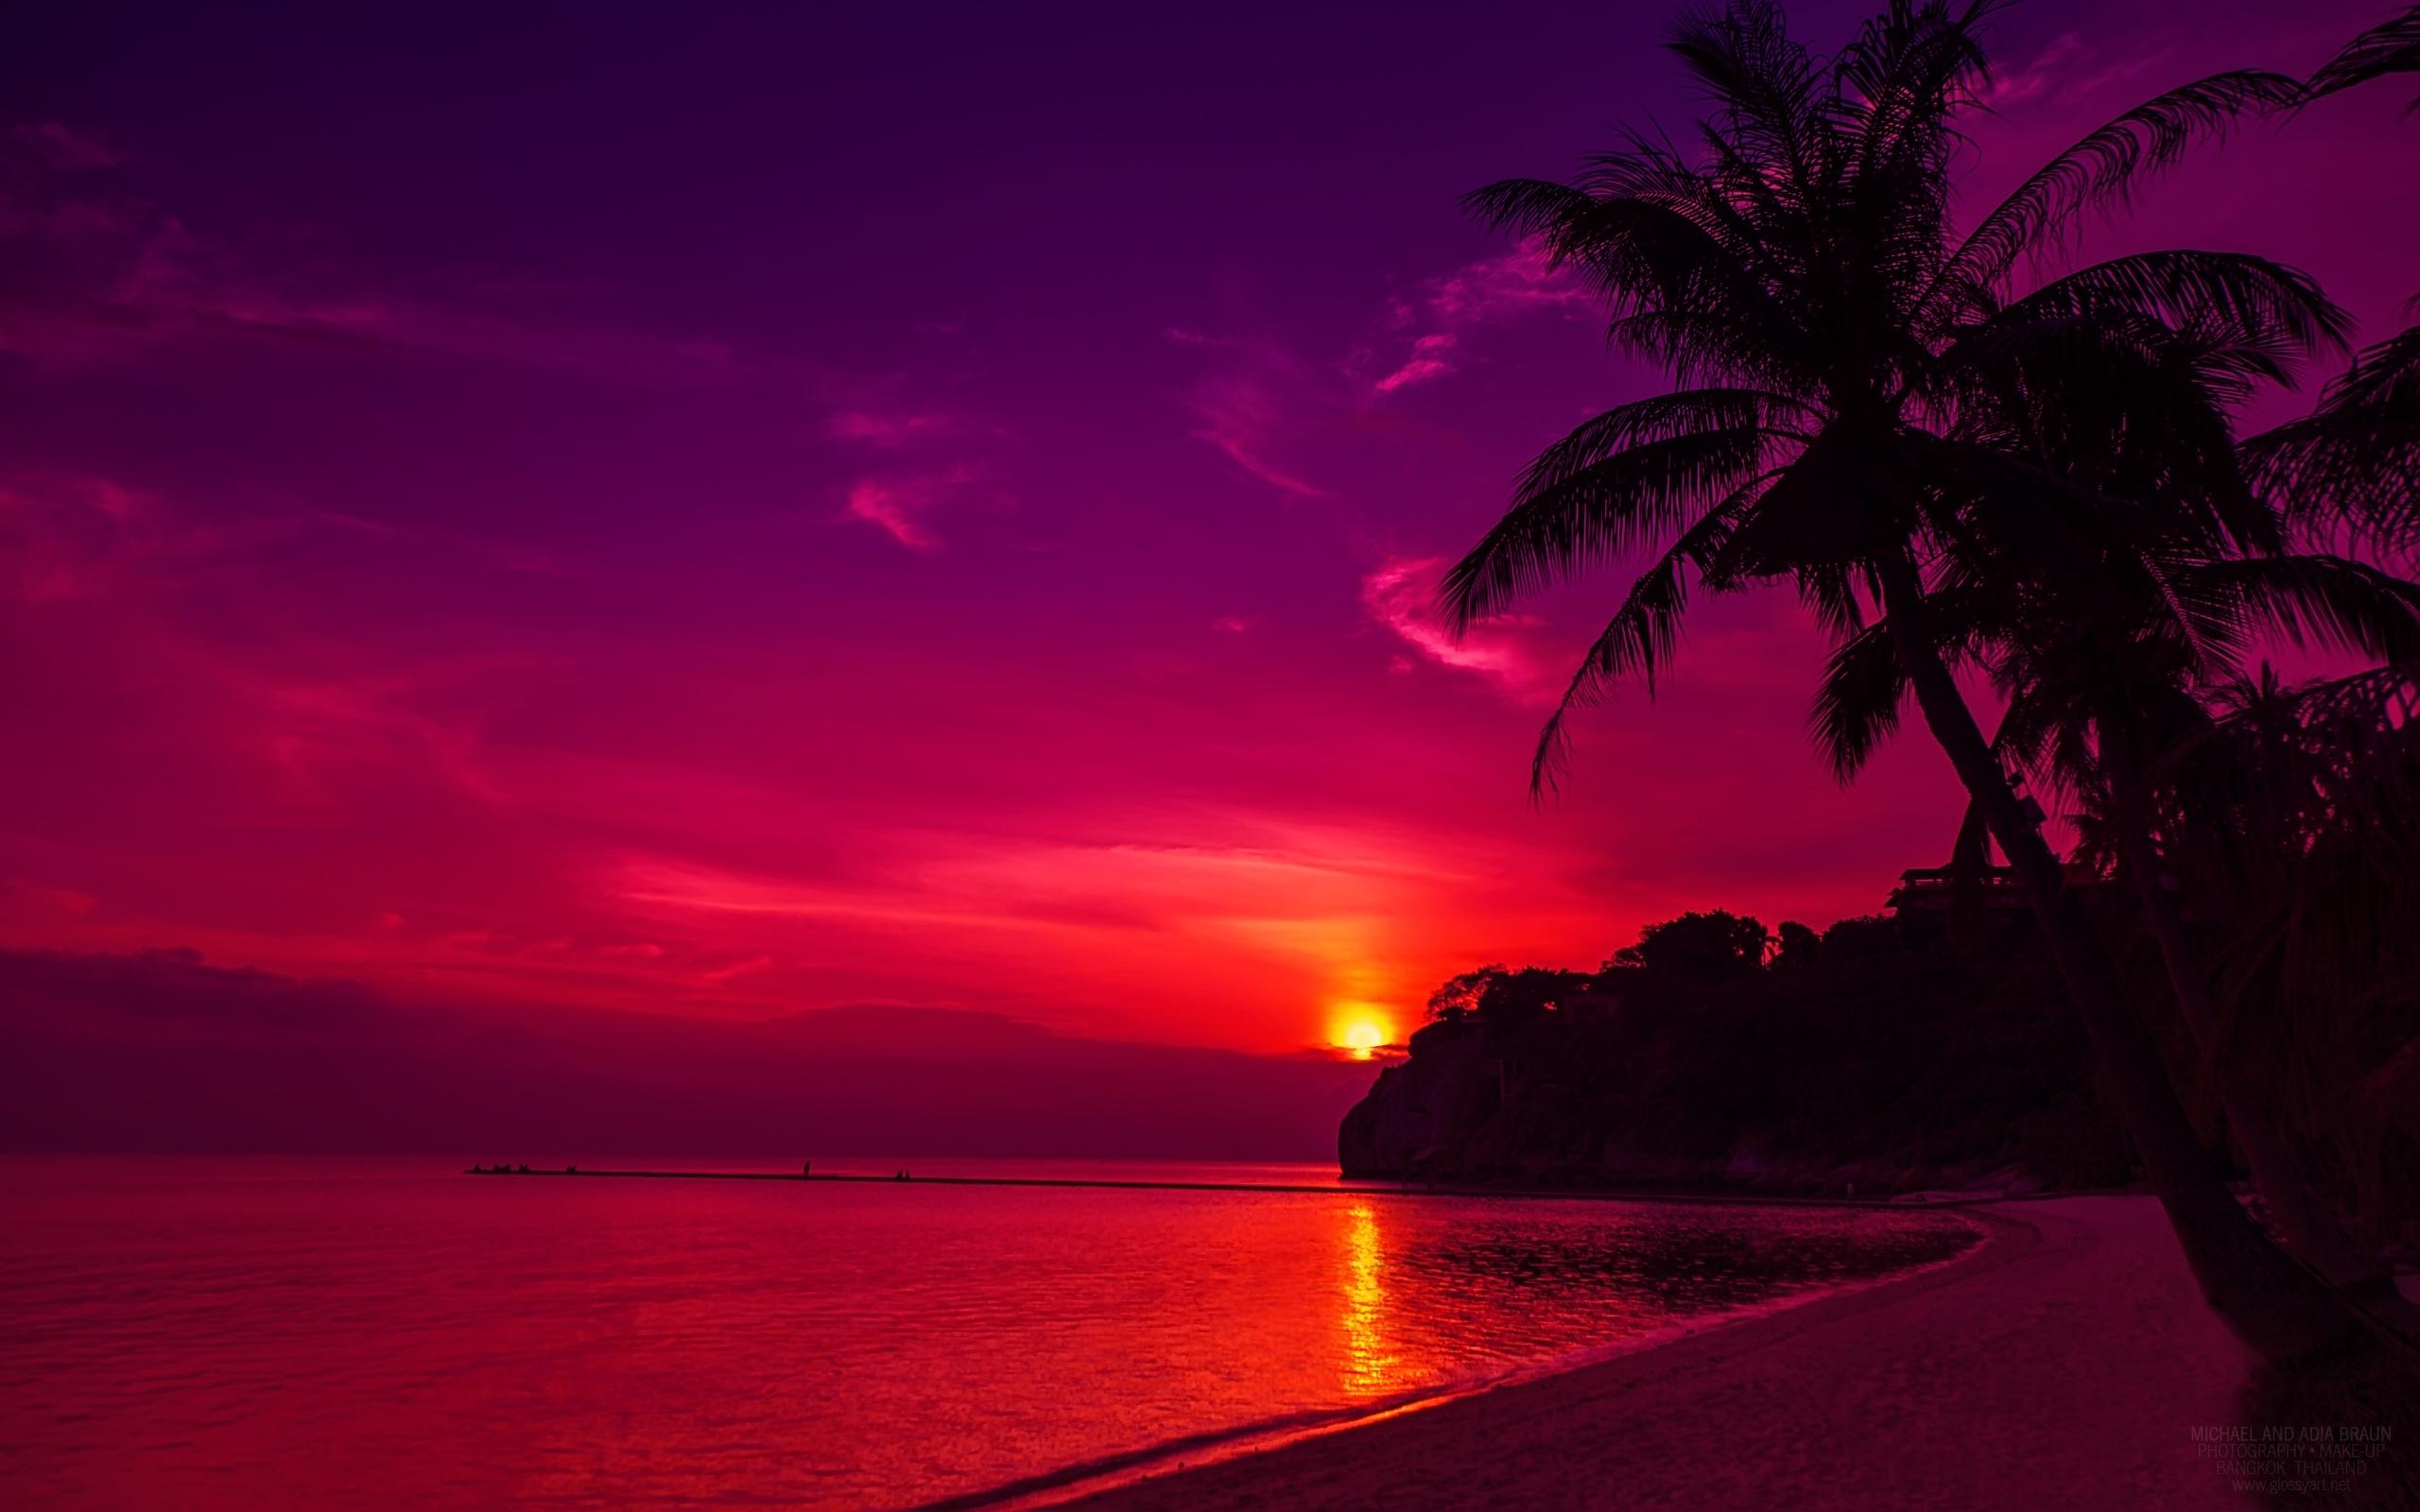 39 Tropical Beach Sunset Wallpaper Desktop On Wallpapersafari